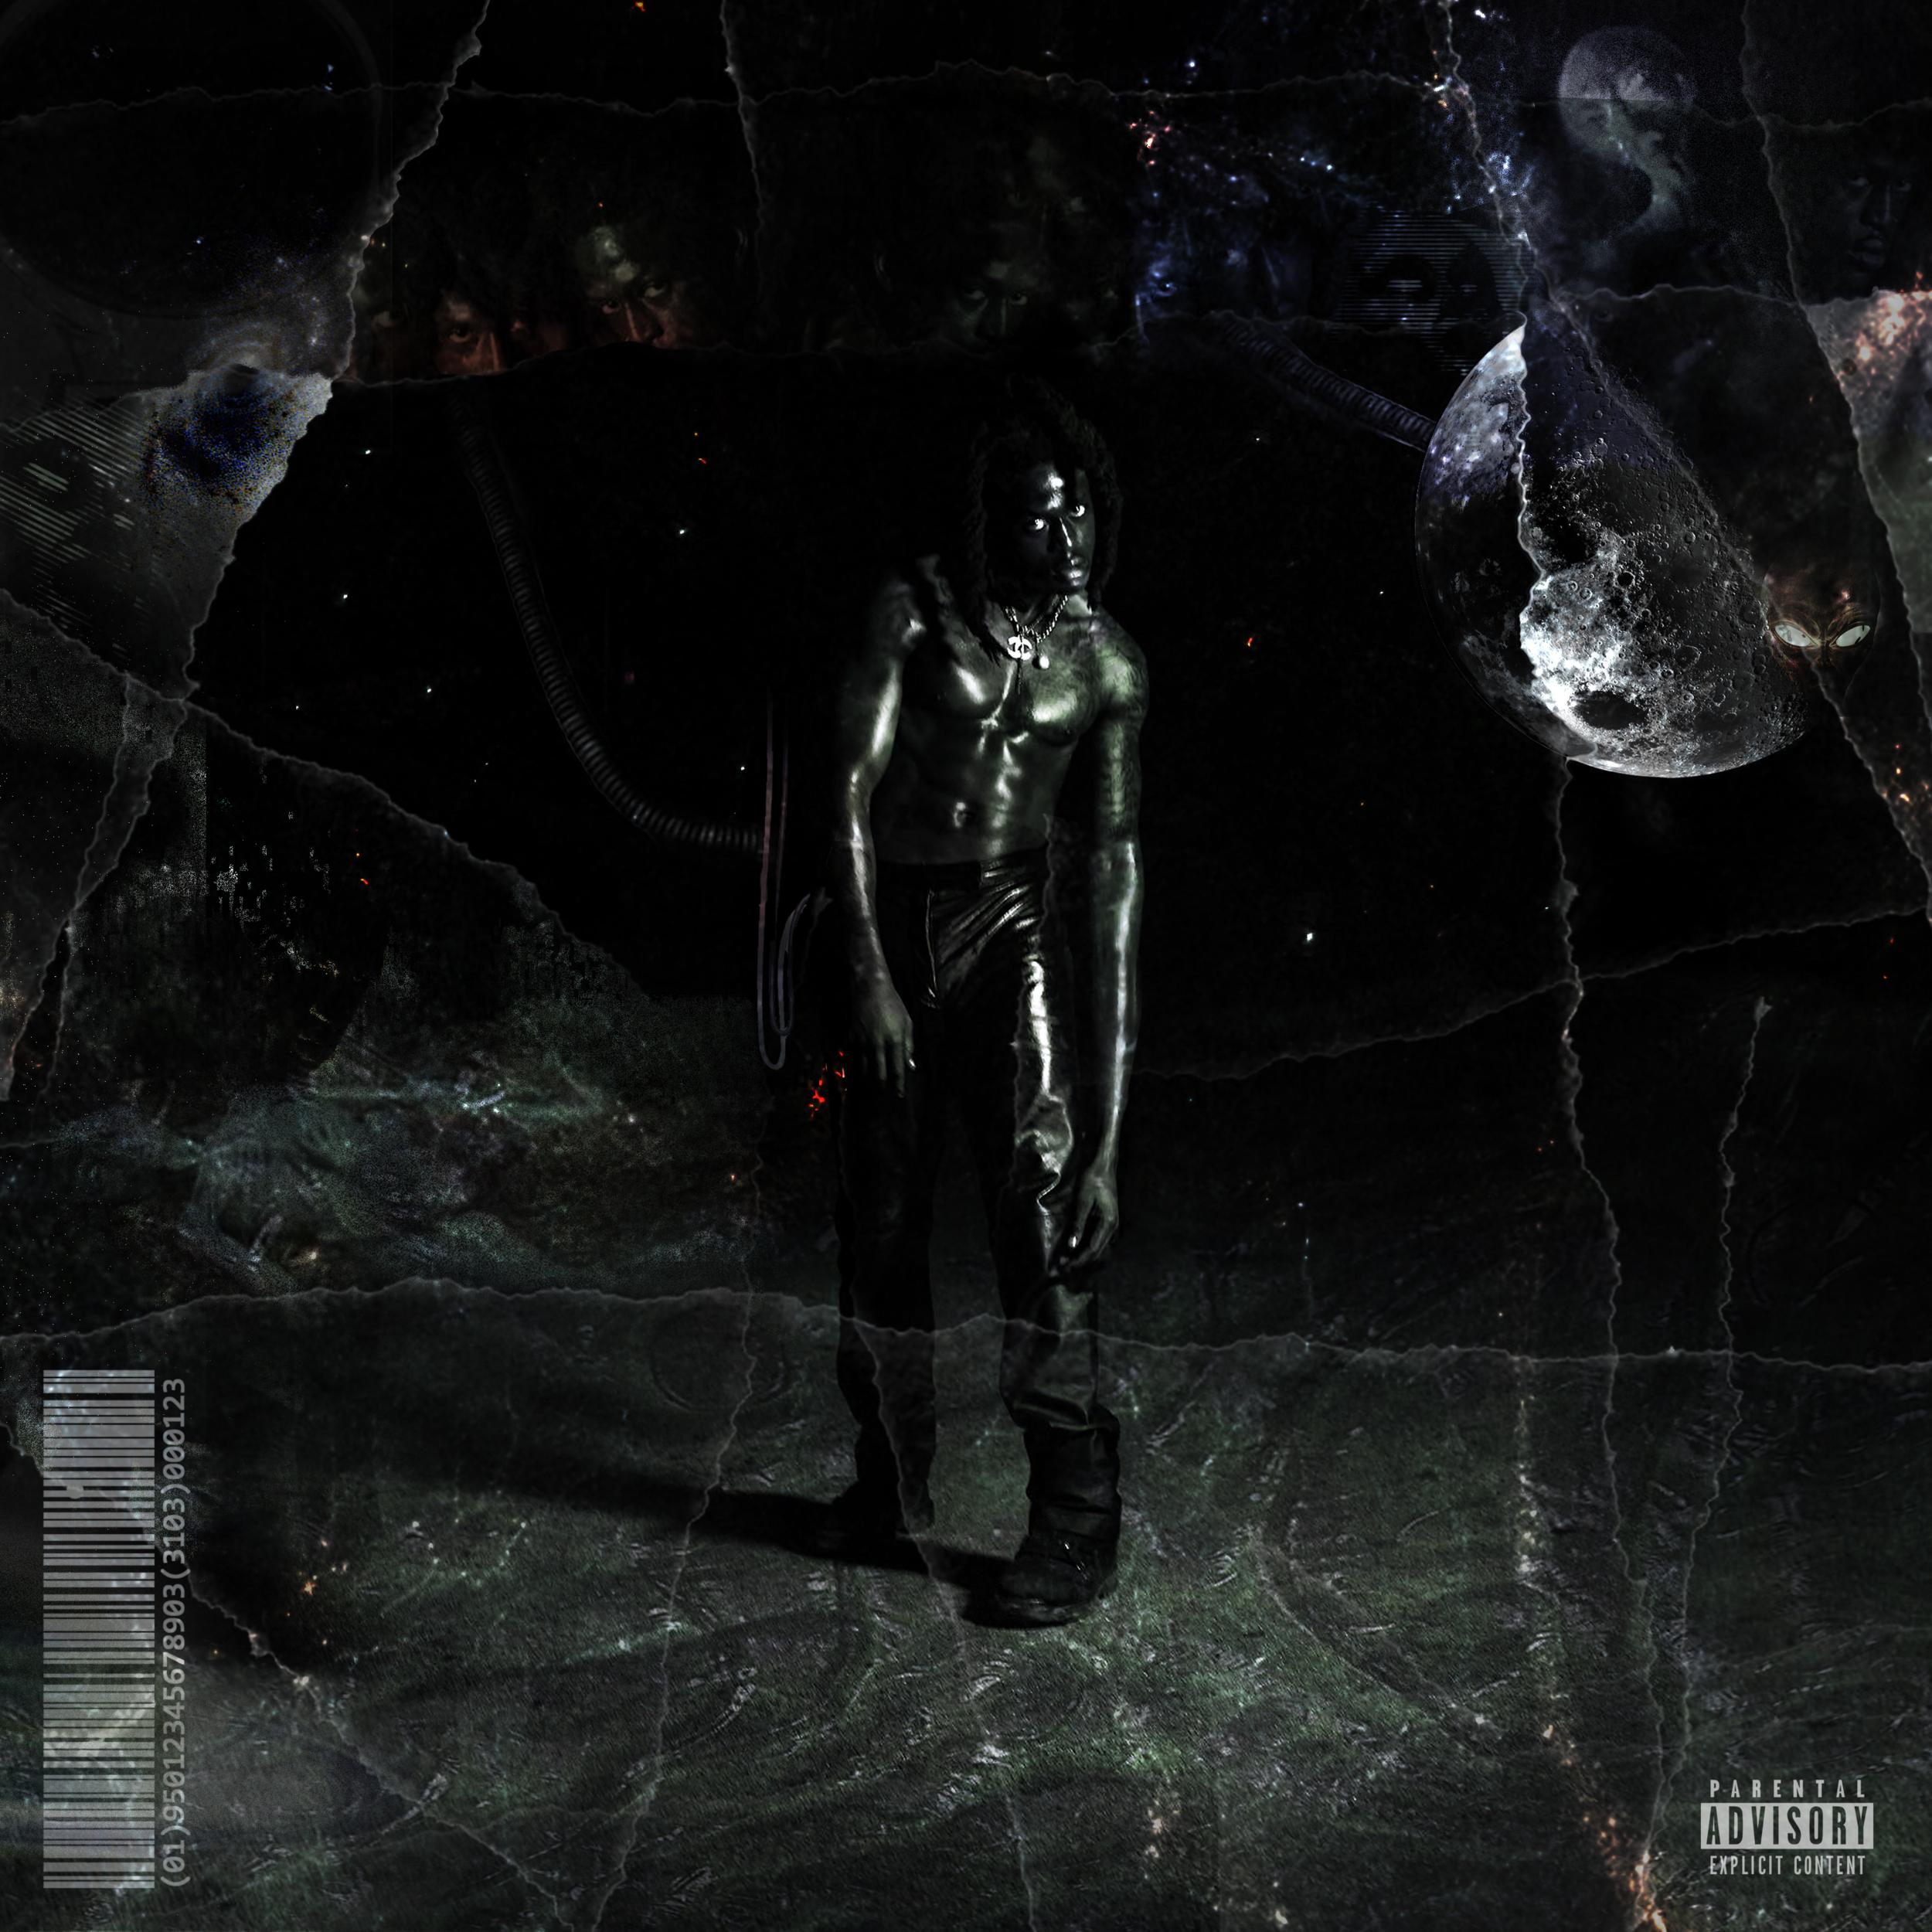 Billyracxx - ALIENATED (Album Cover Art).png